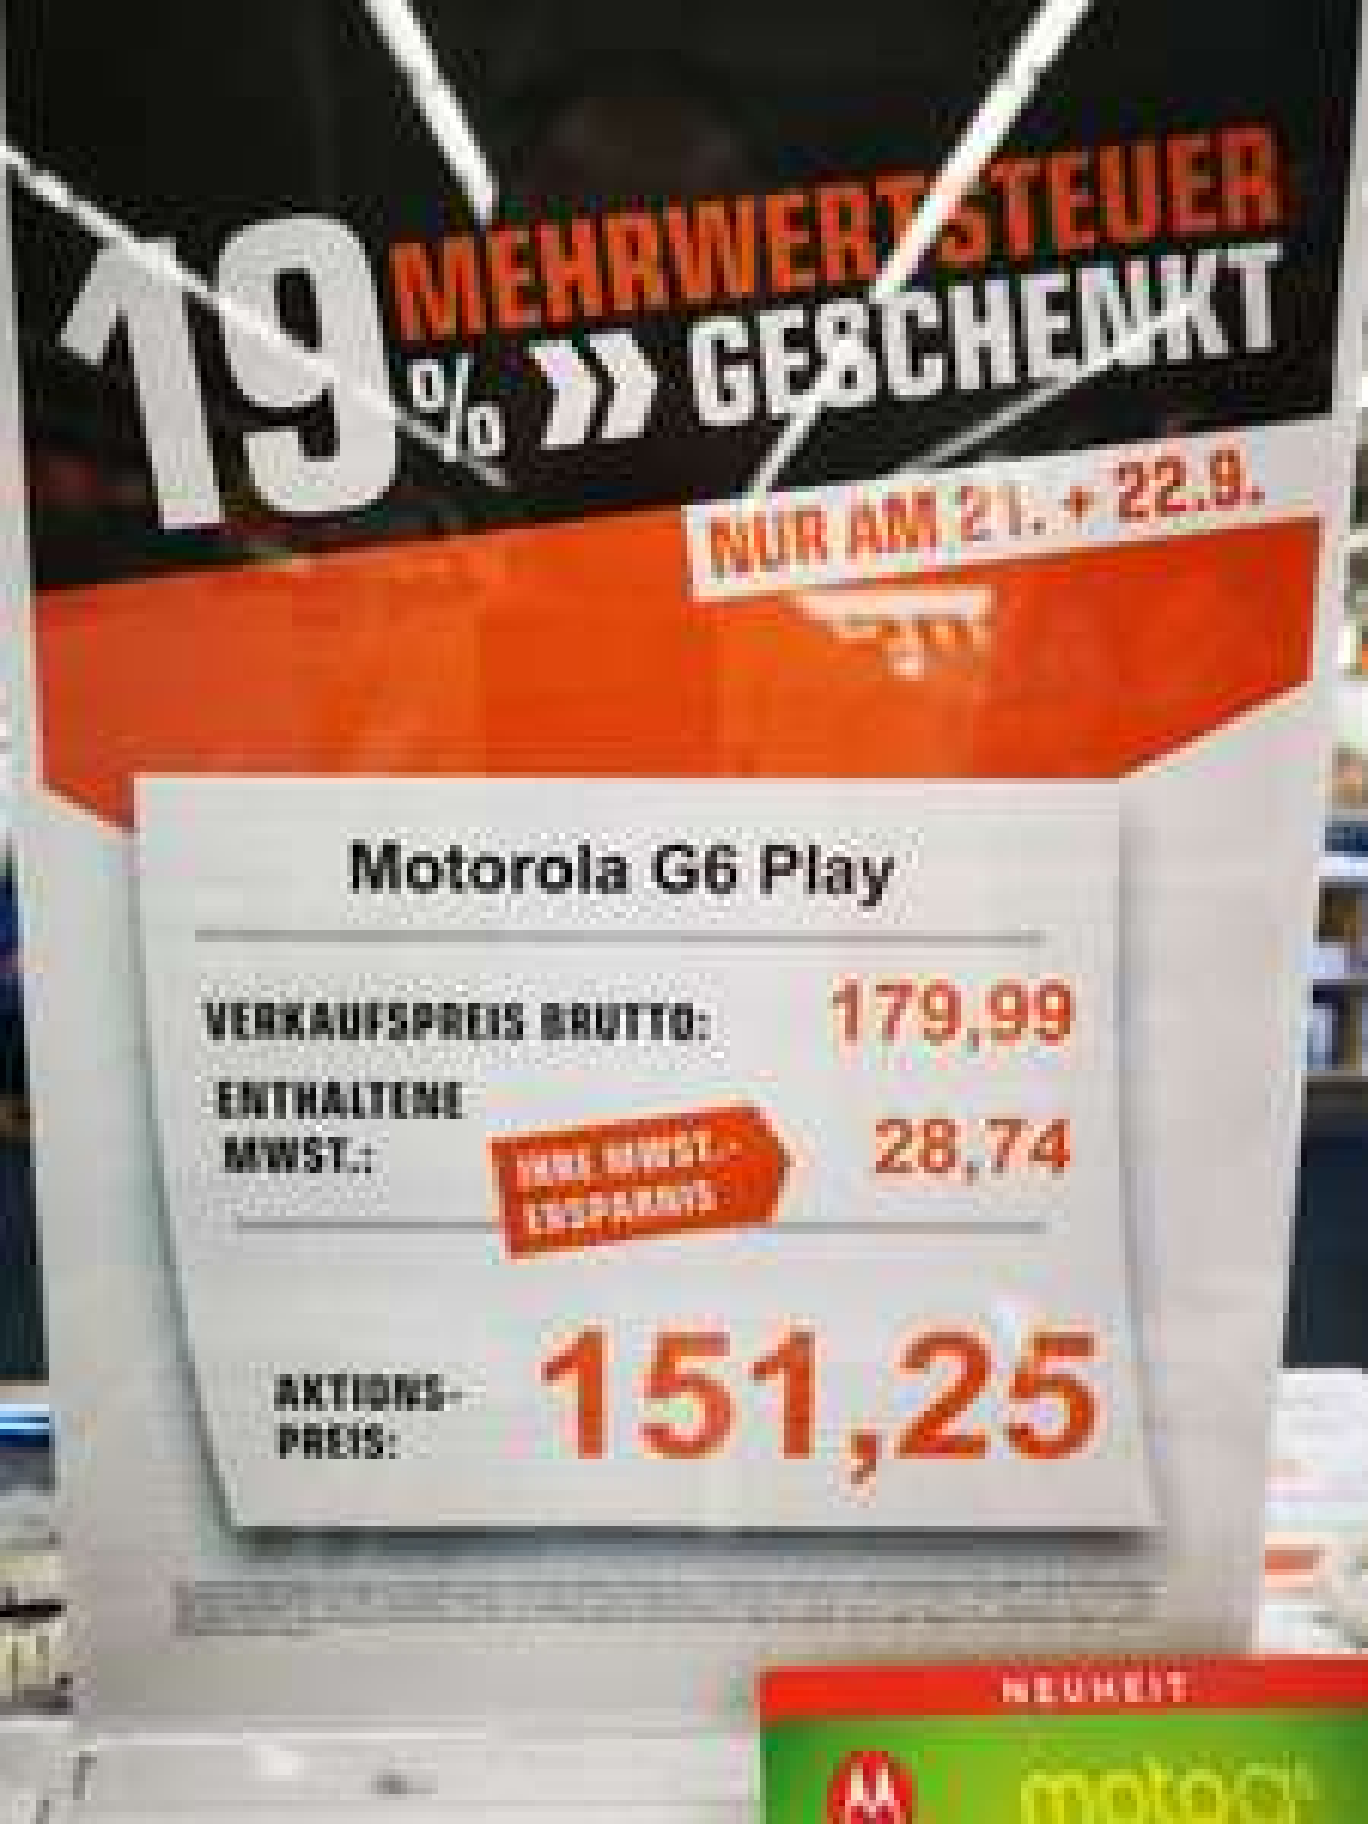 Saturn Mehrwertsteuer Deal Motorola G6 Play / Samsung S8